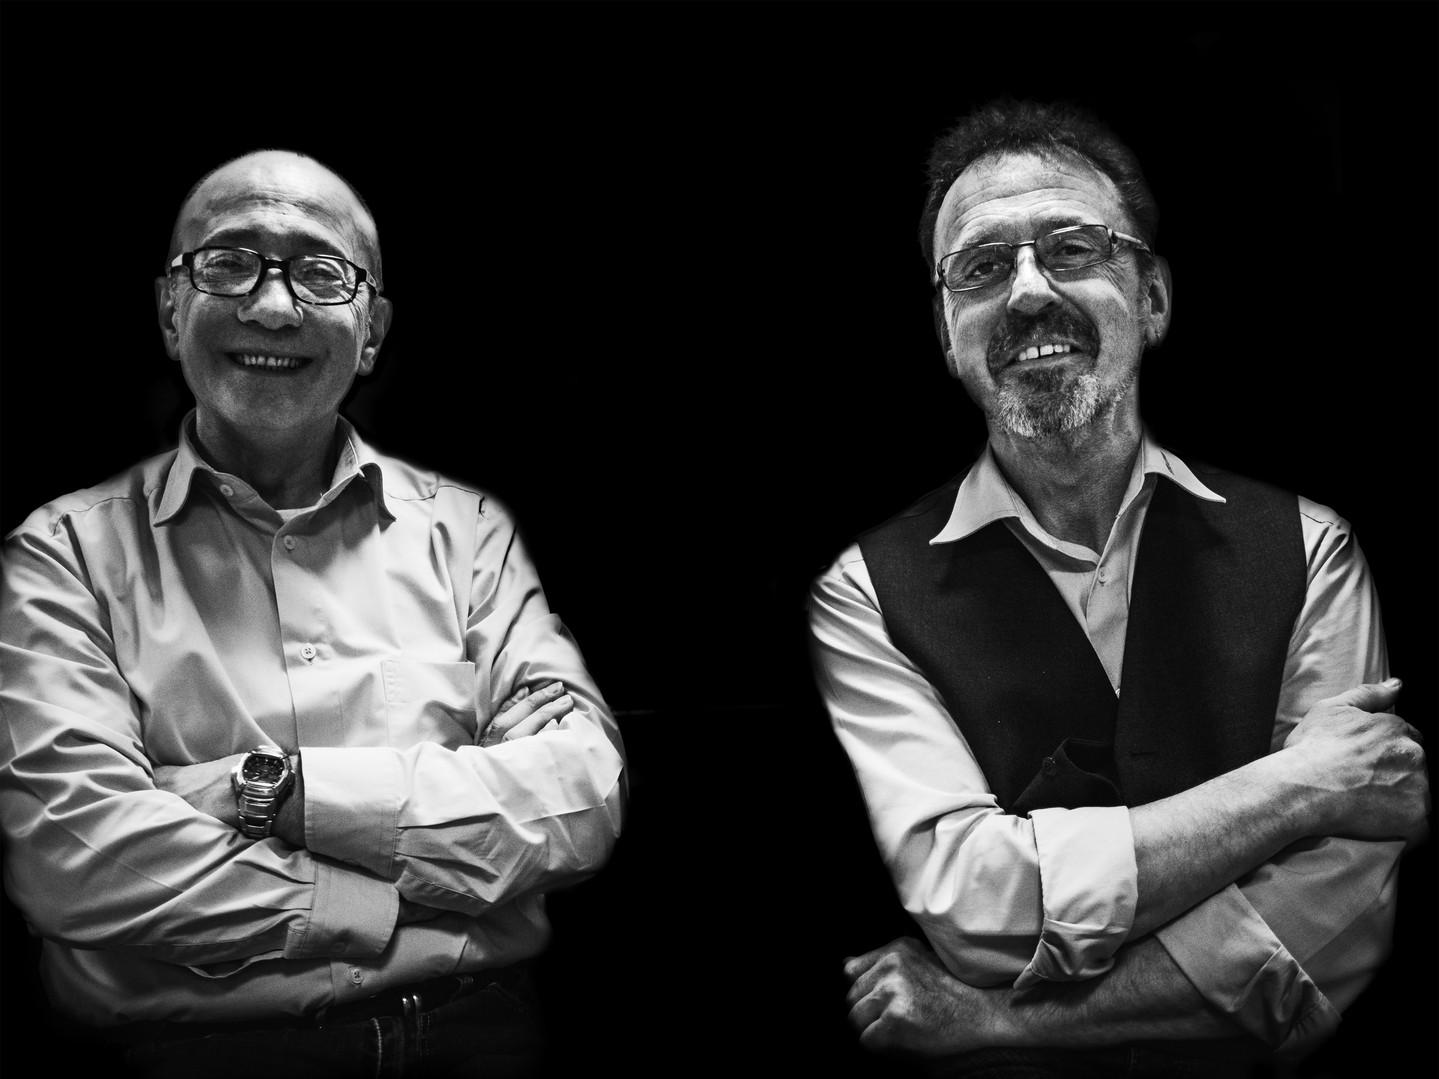 Paolo & Joachim